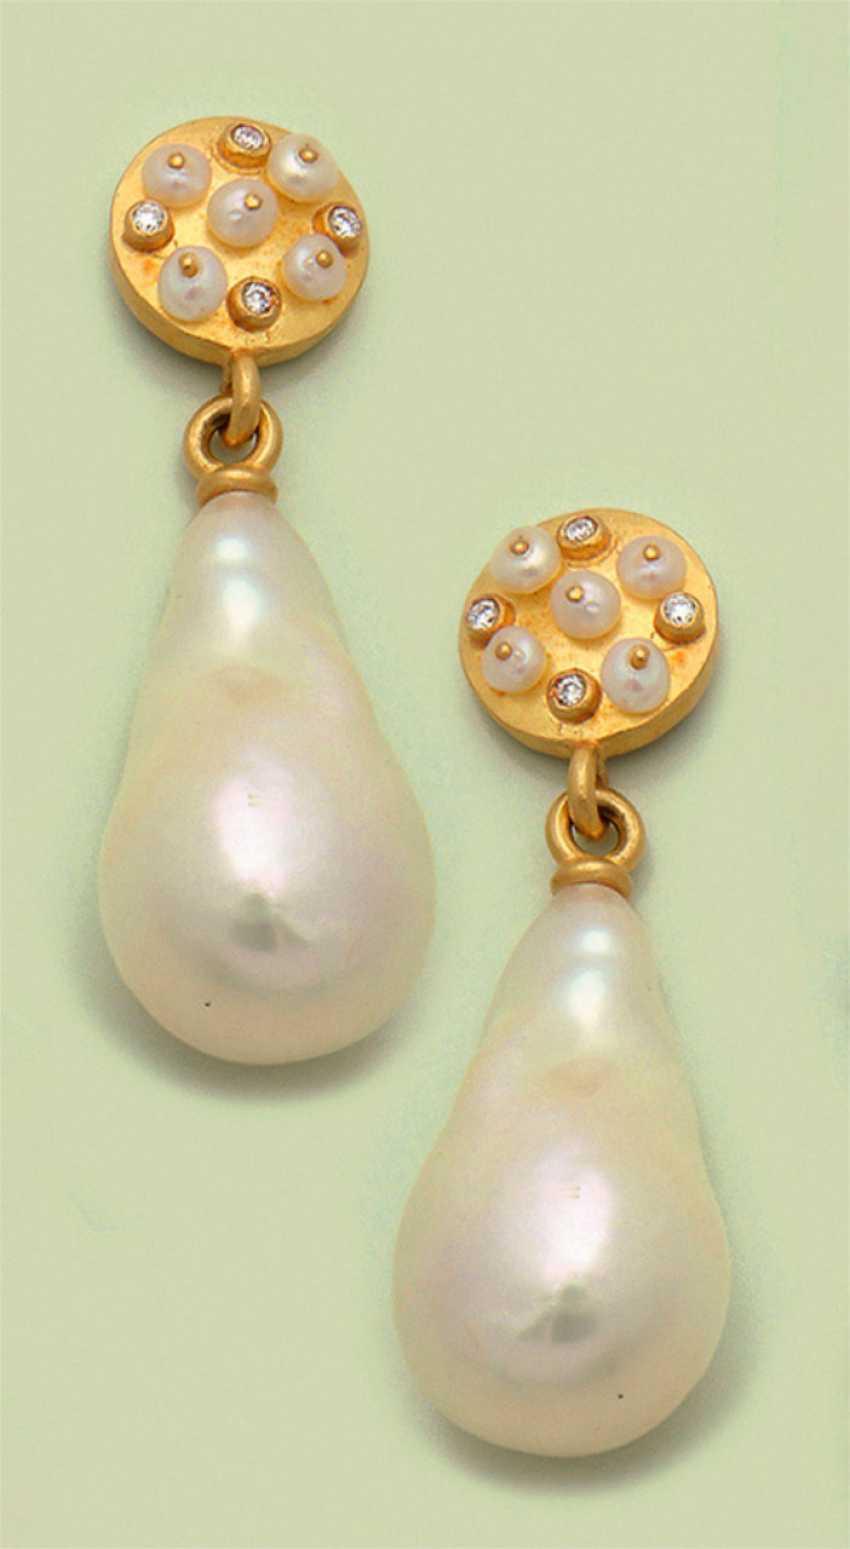 Pair of pearl earrings by Frank Kutzick, Hamburg - photo 1